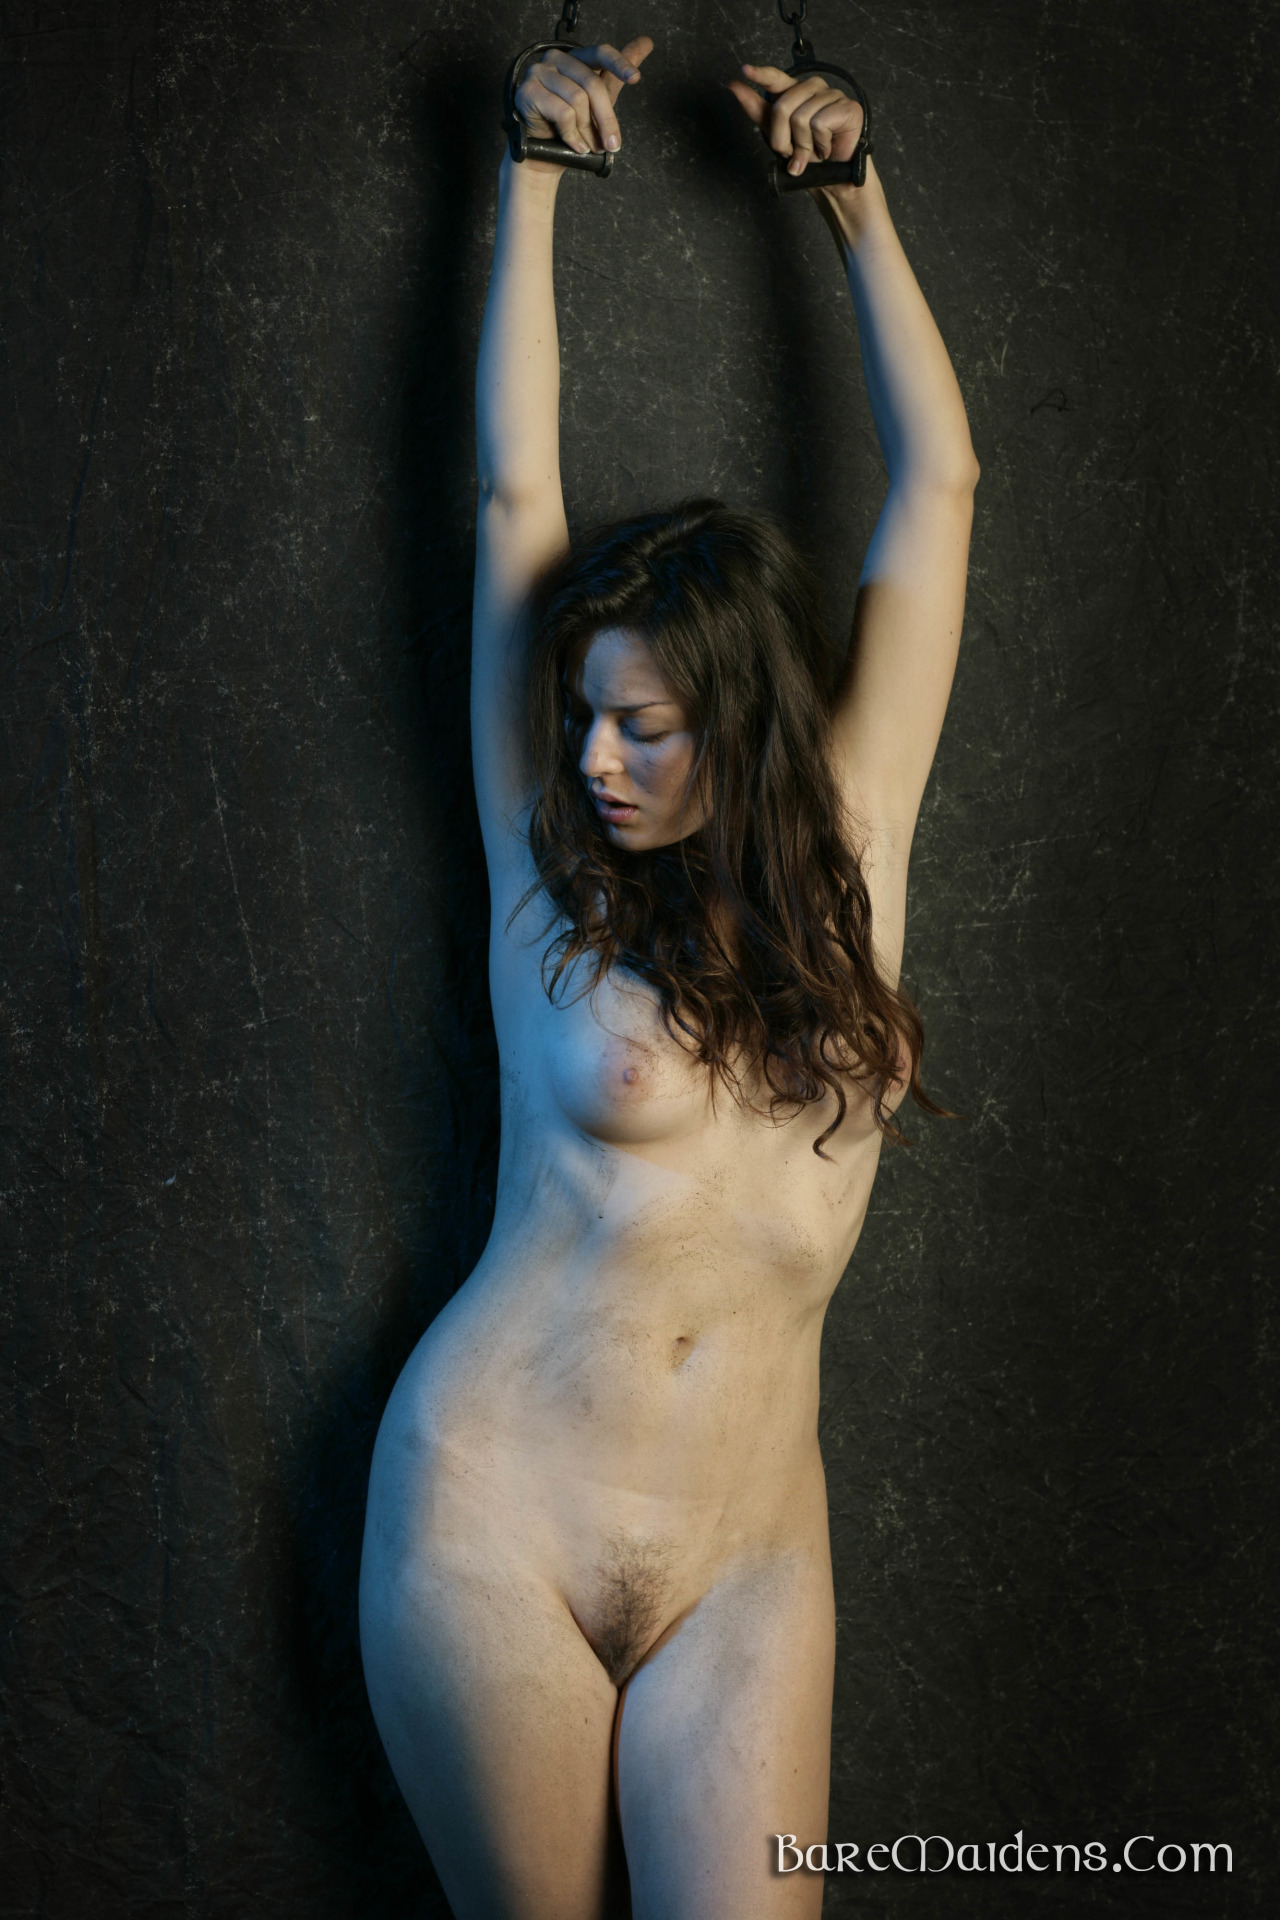 Baremwidends Porn Film Online Free sex images | amanda's dark place | porn picsthe-sex